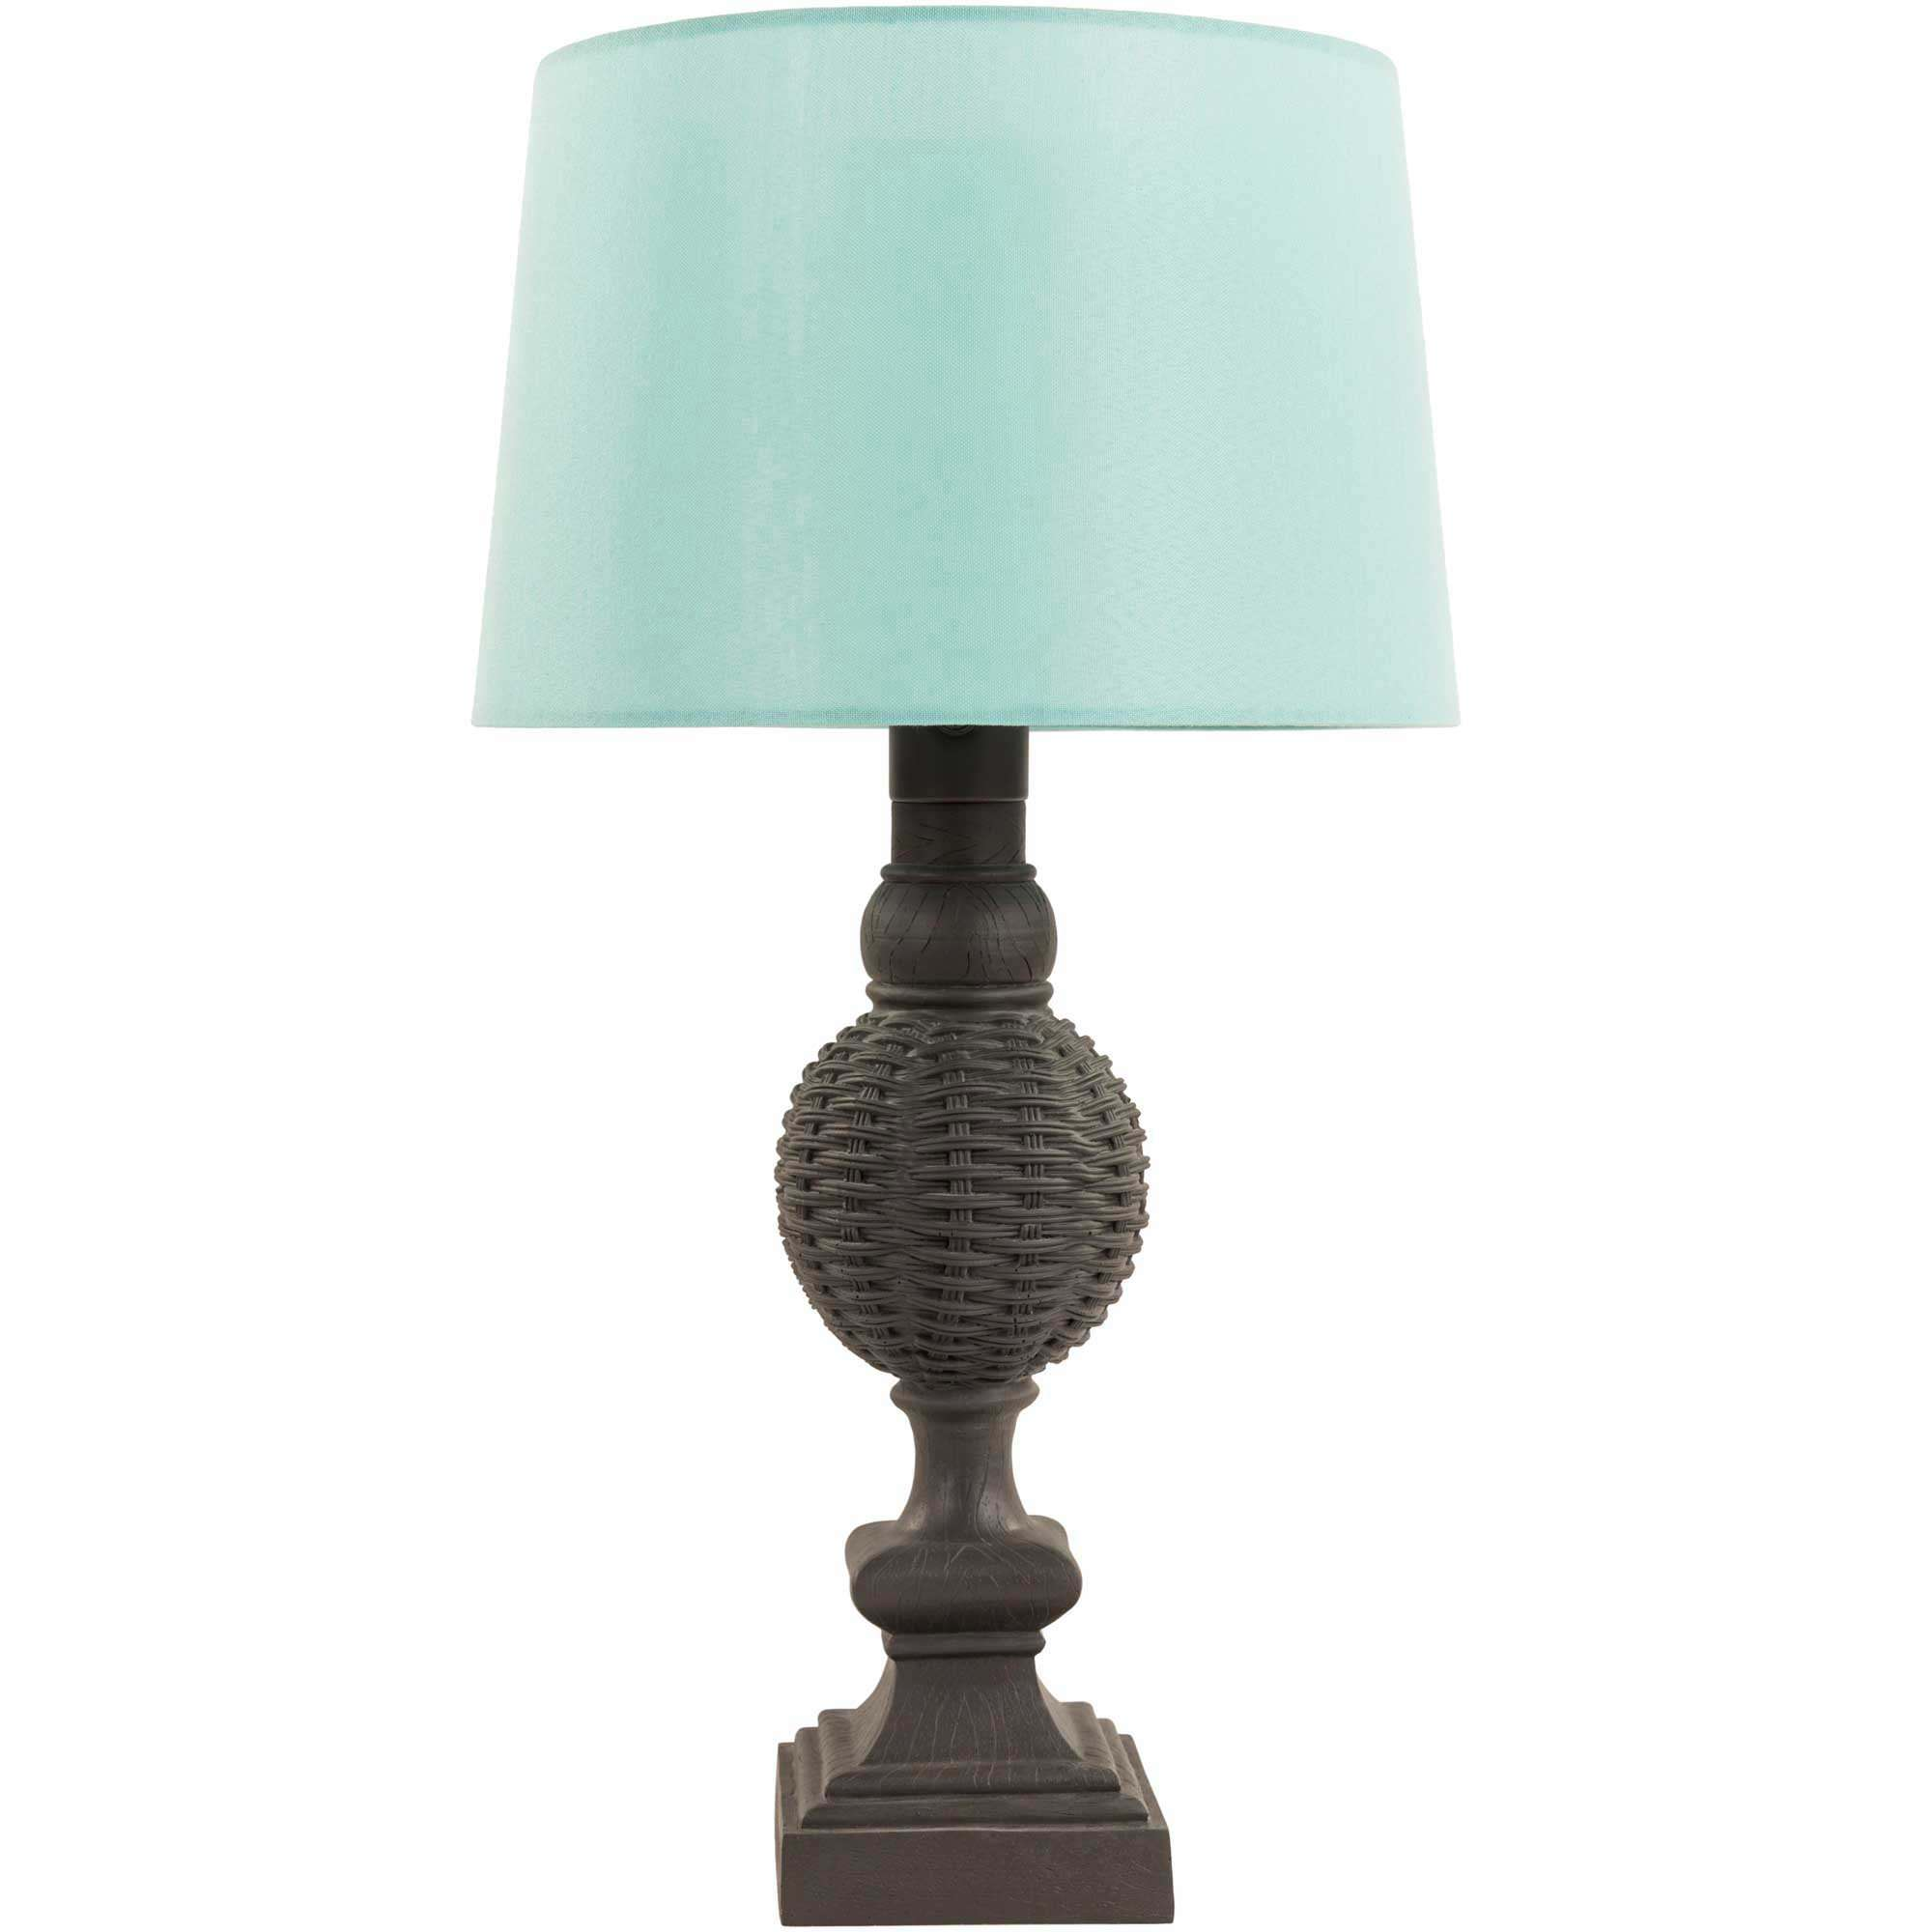 Miller Table Lamp Aqua 32 In Tall